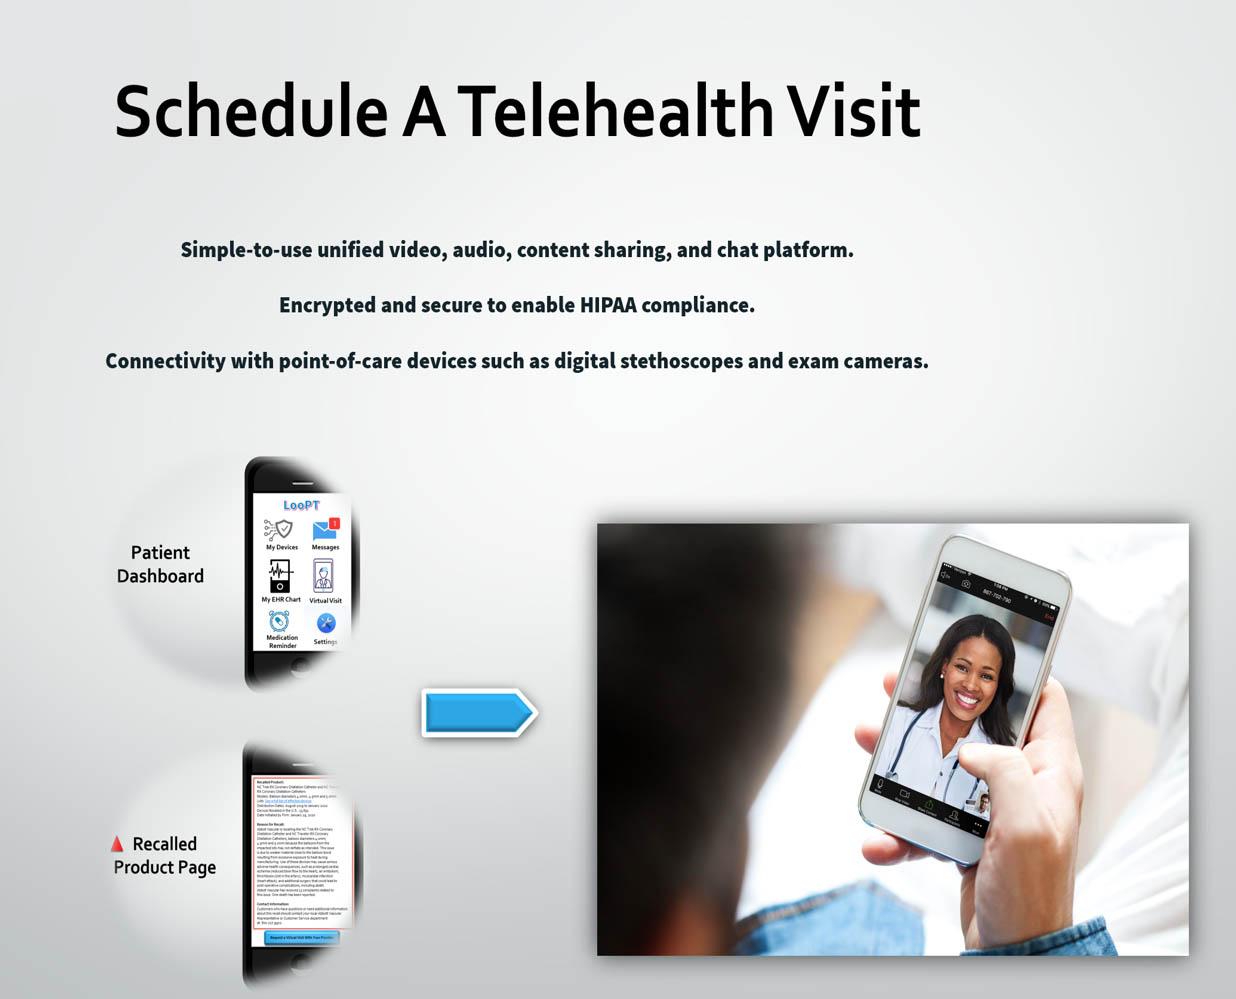 Schedule a telehealth visit